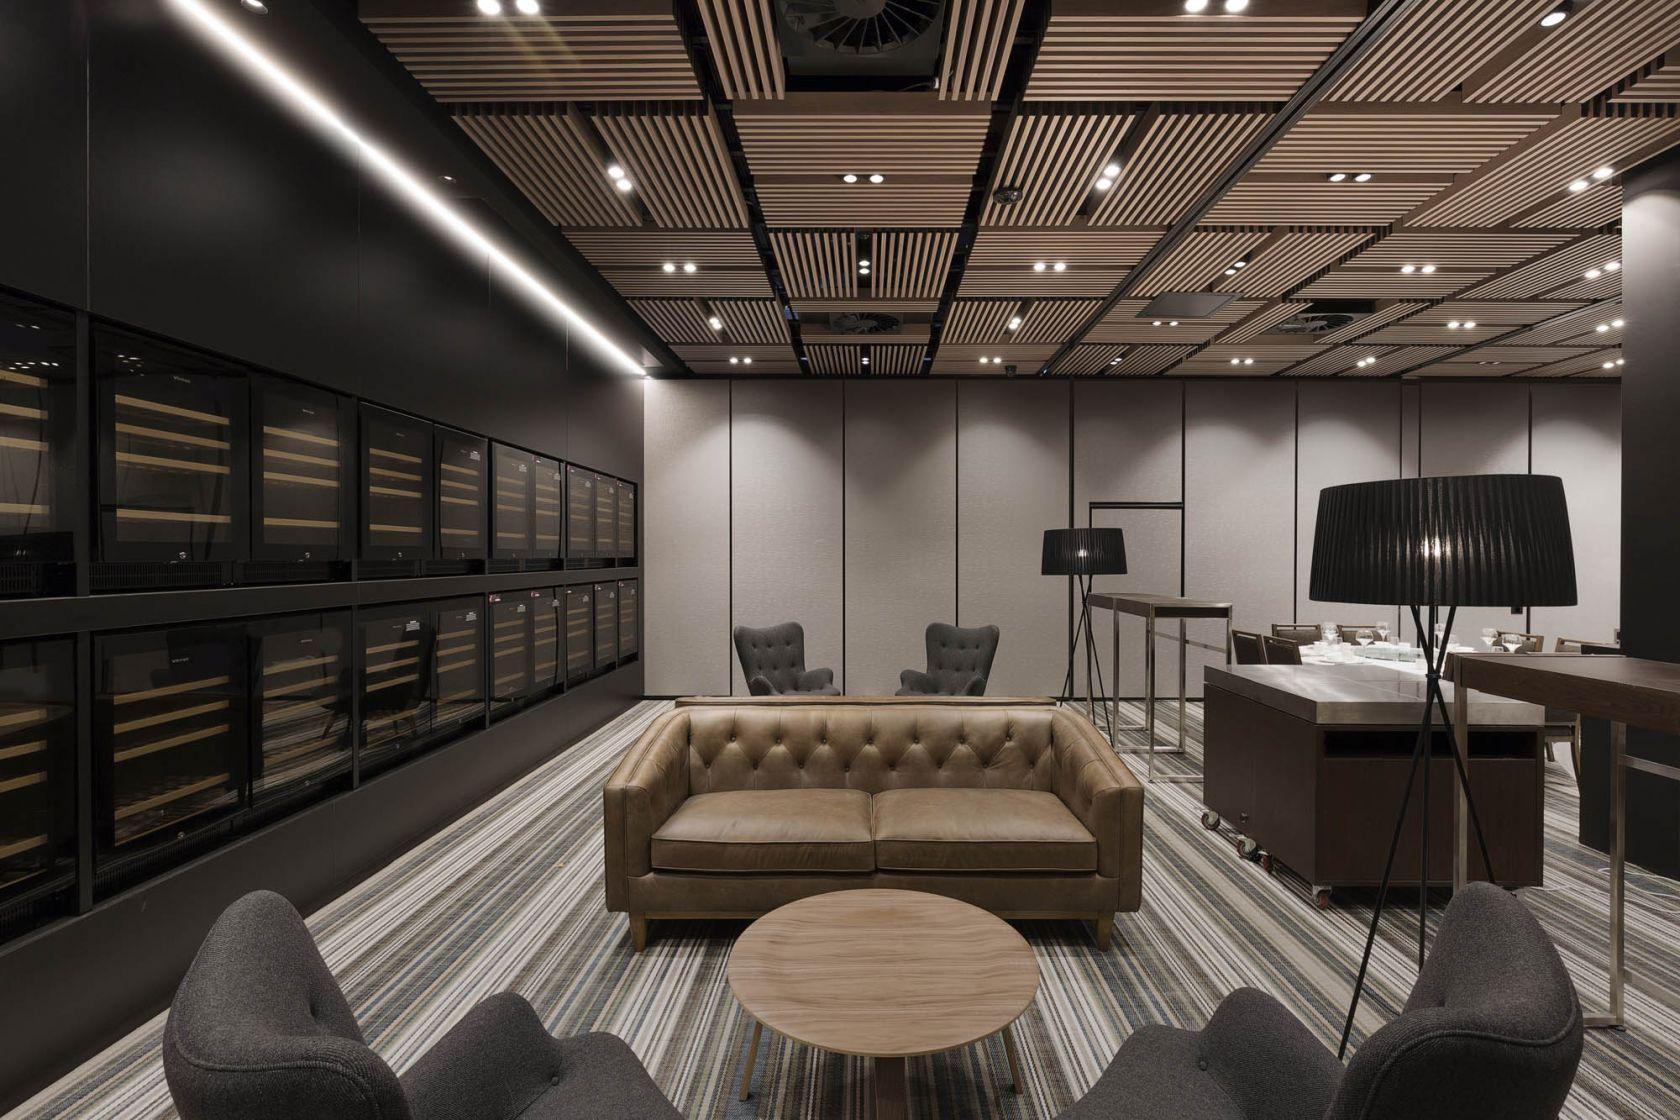 Golden Century Restaurant Fitout waiting feature ceiling lounge